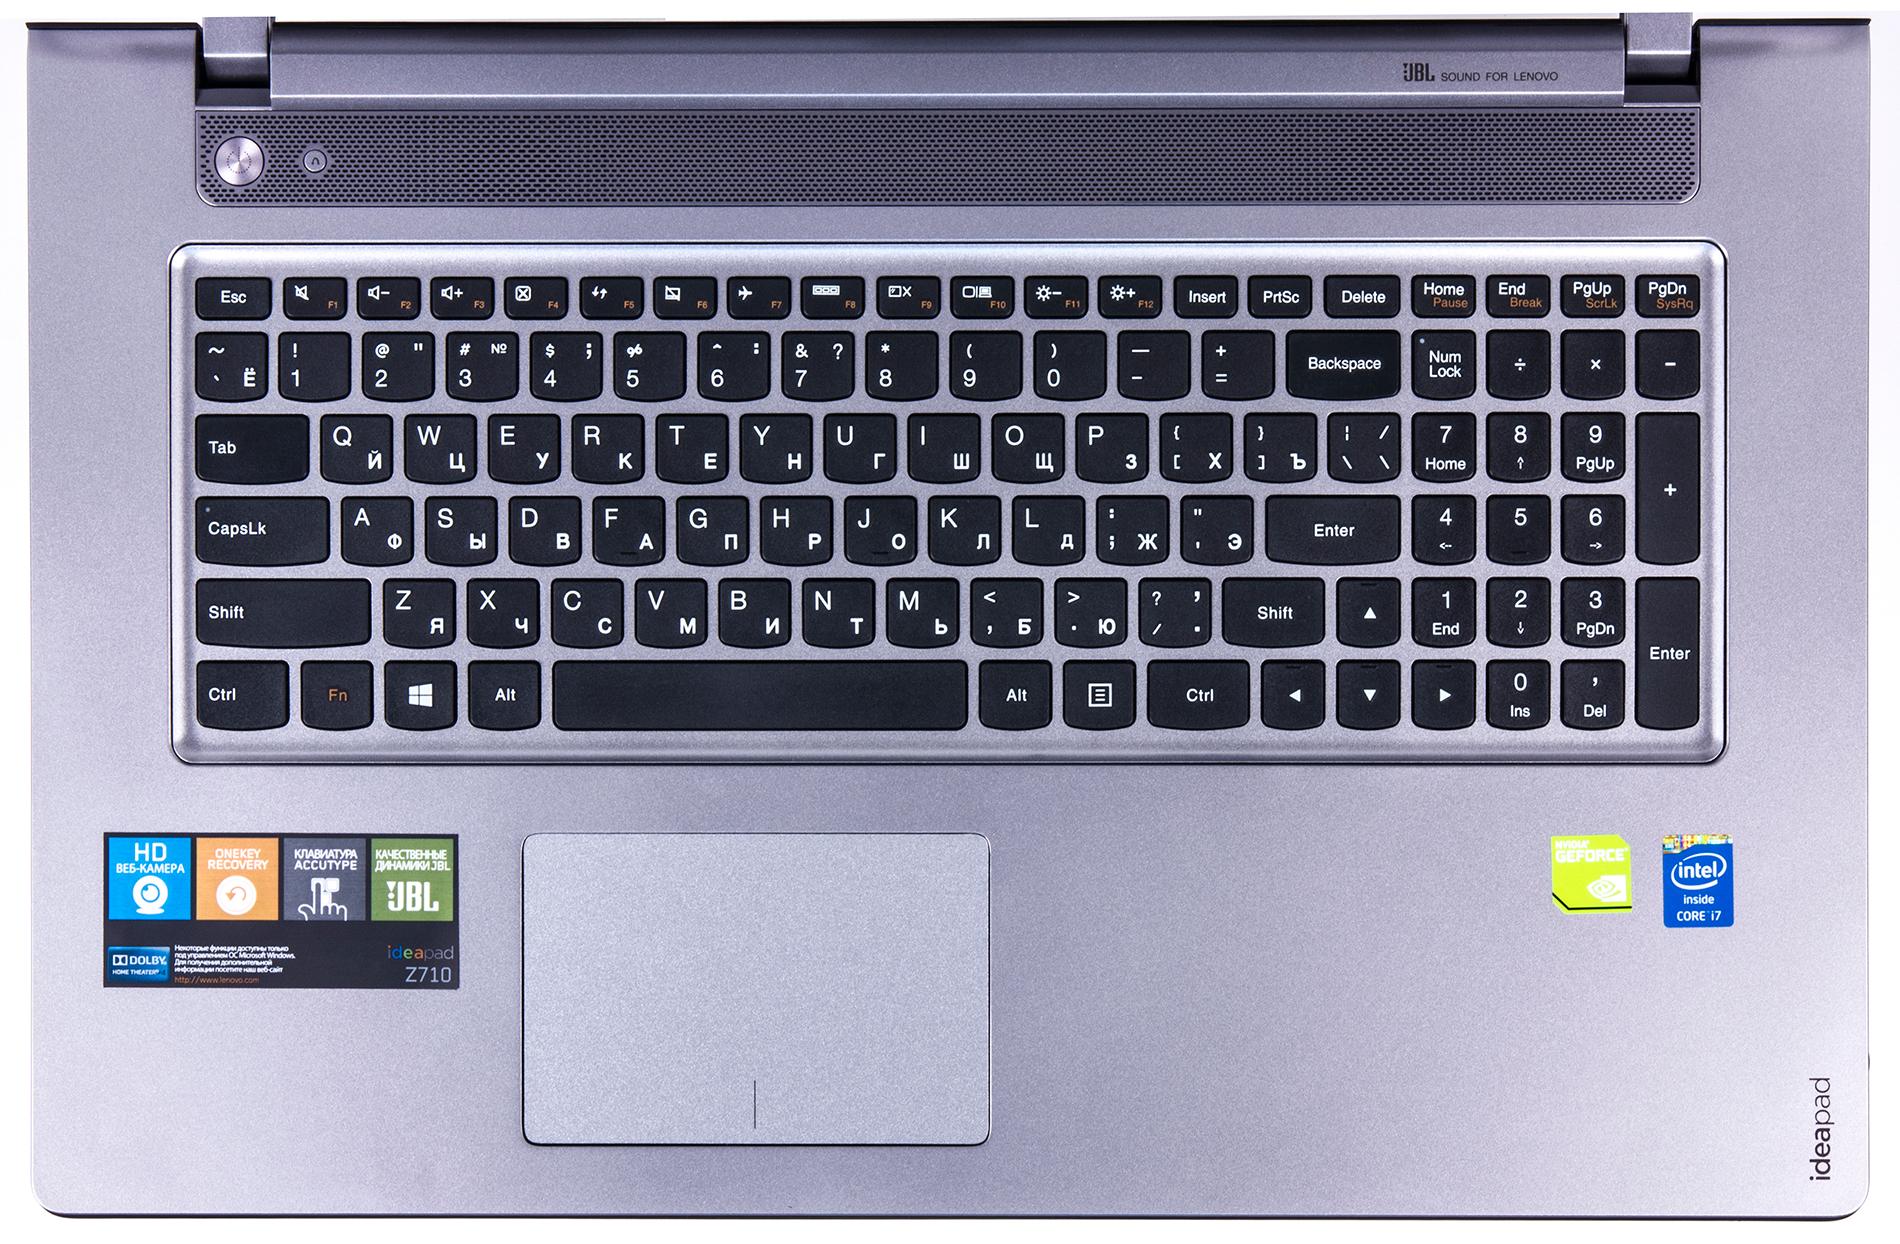 Lenovo IdeaPad Z710 Qualcomm WLAN Driver for Windows 7